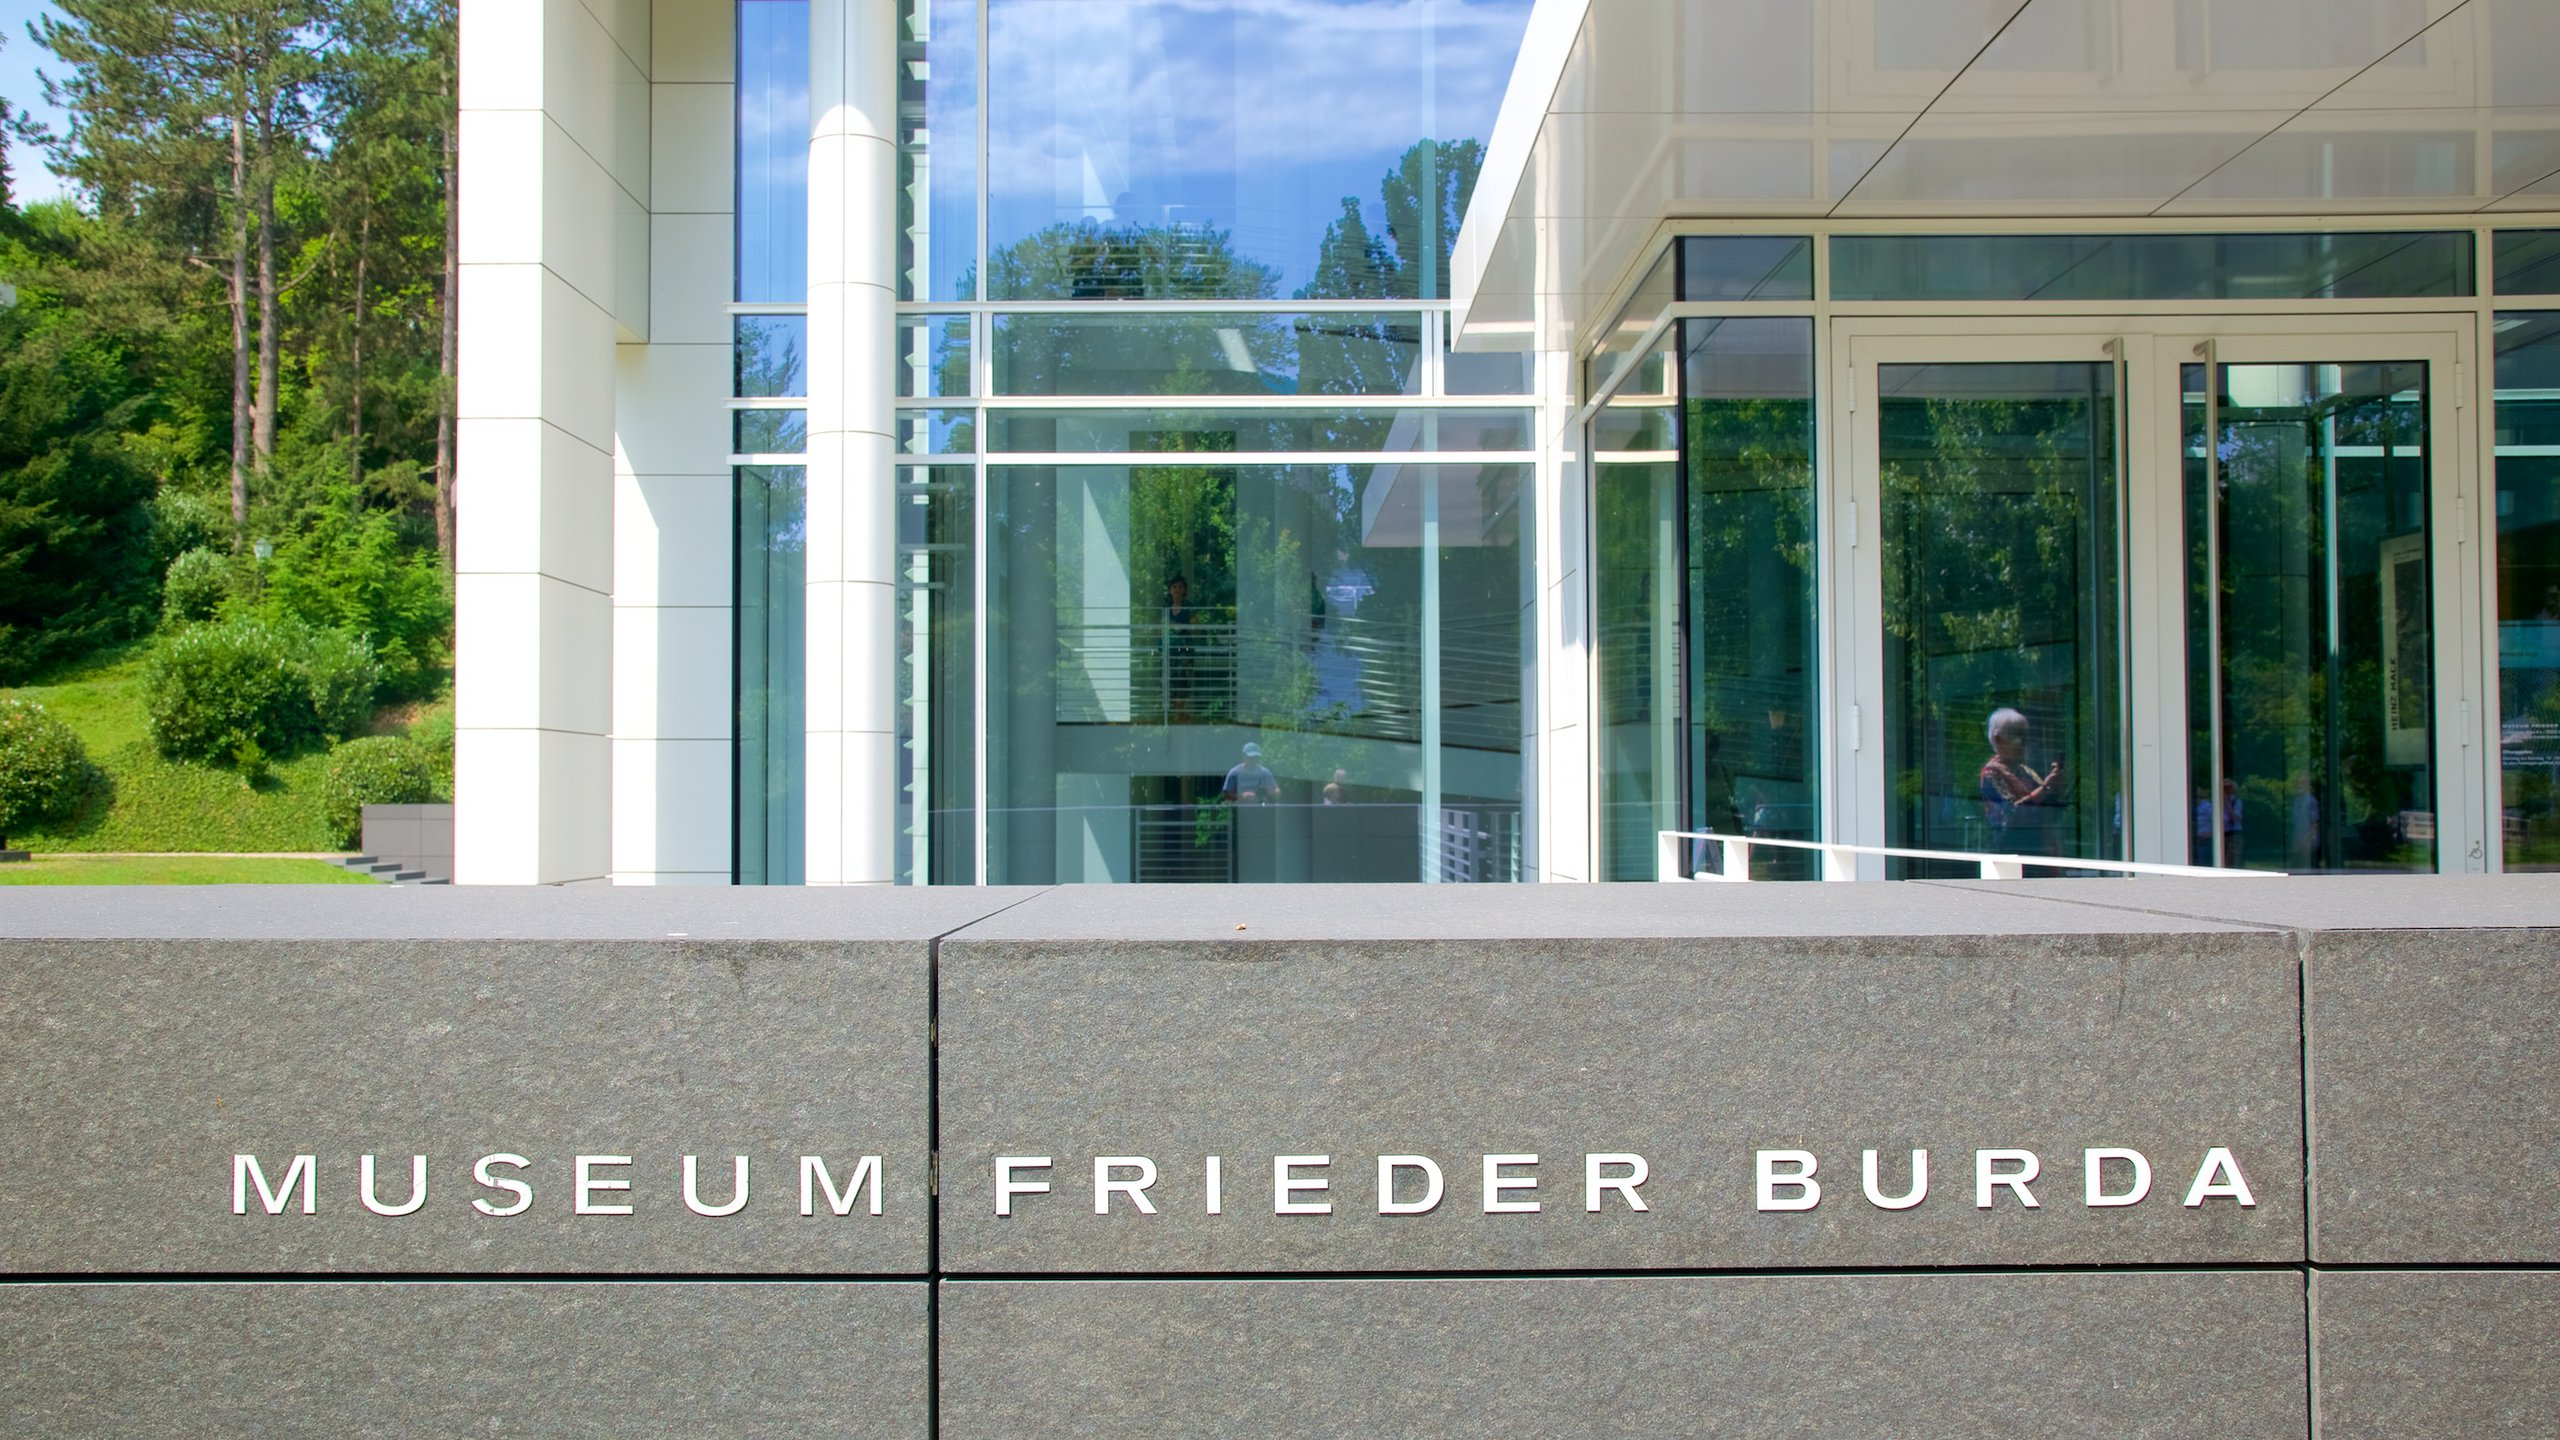 Museum Frieder Burda, Baden-Baden, Baden-Wuerttemberg, Duitsland